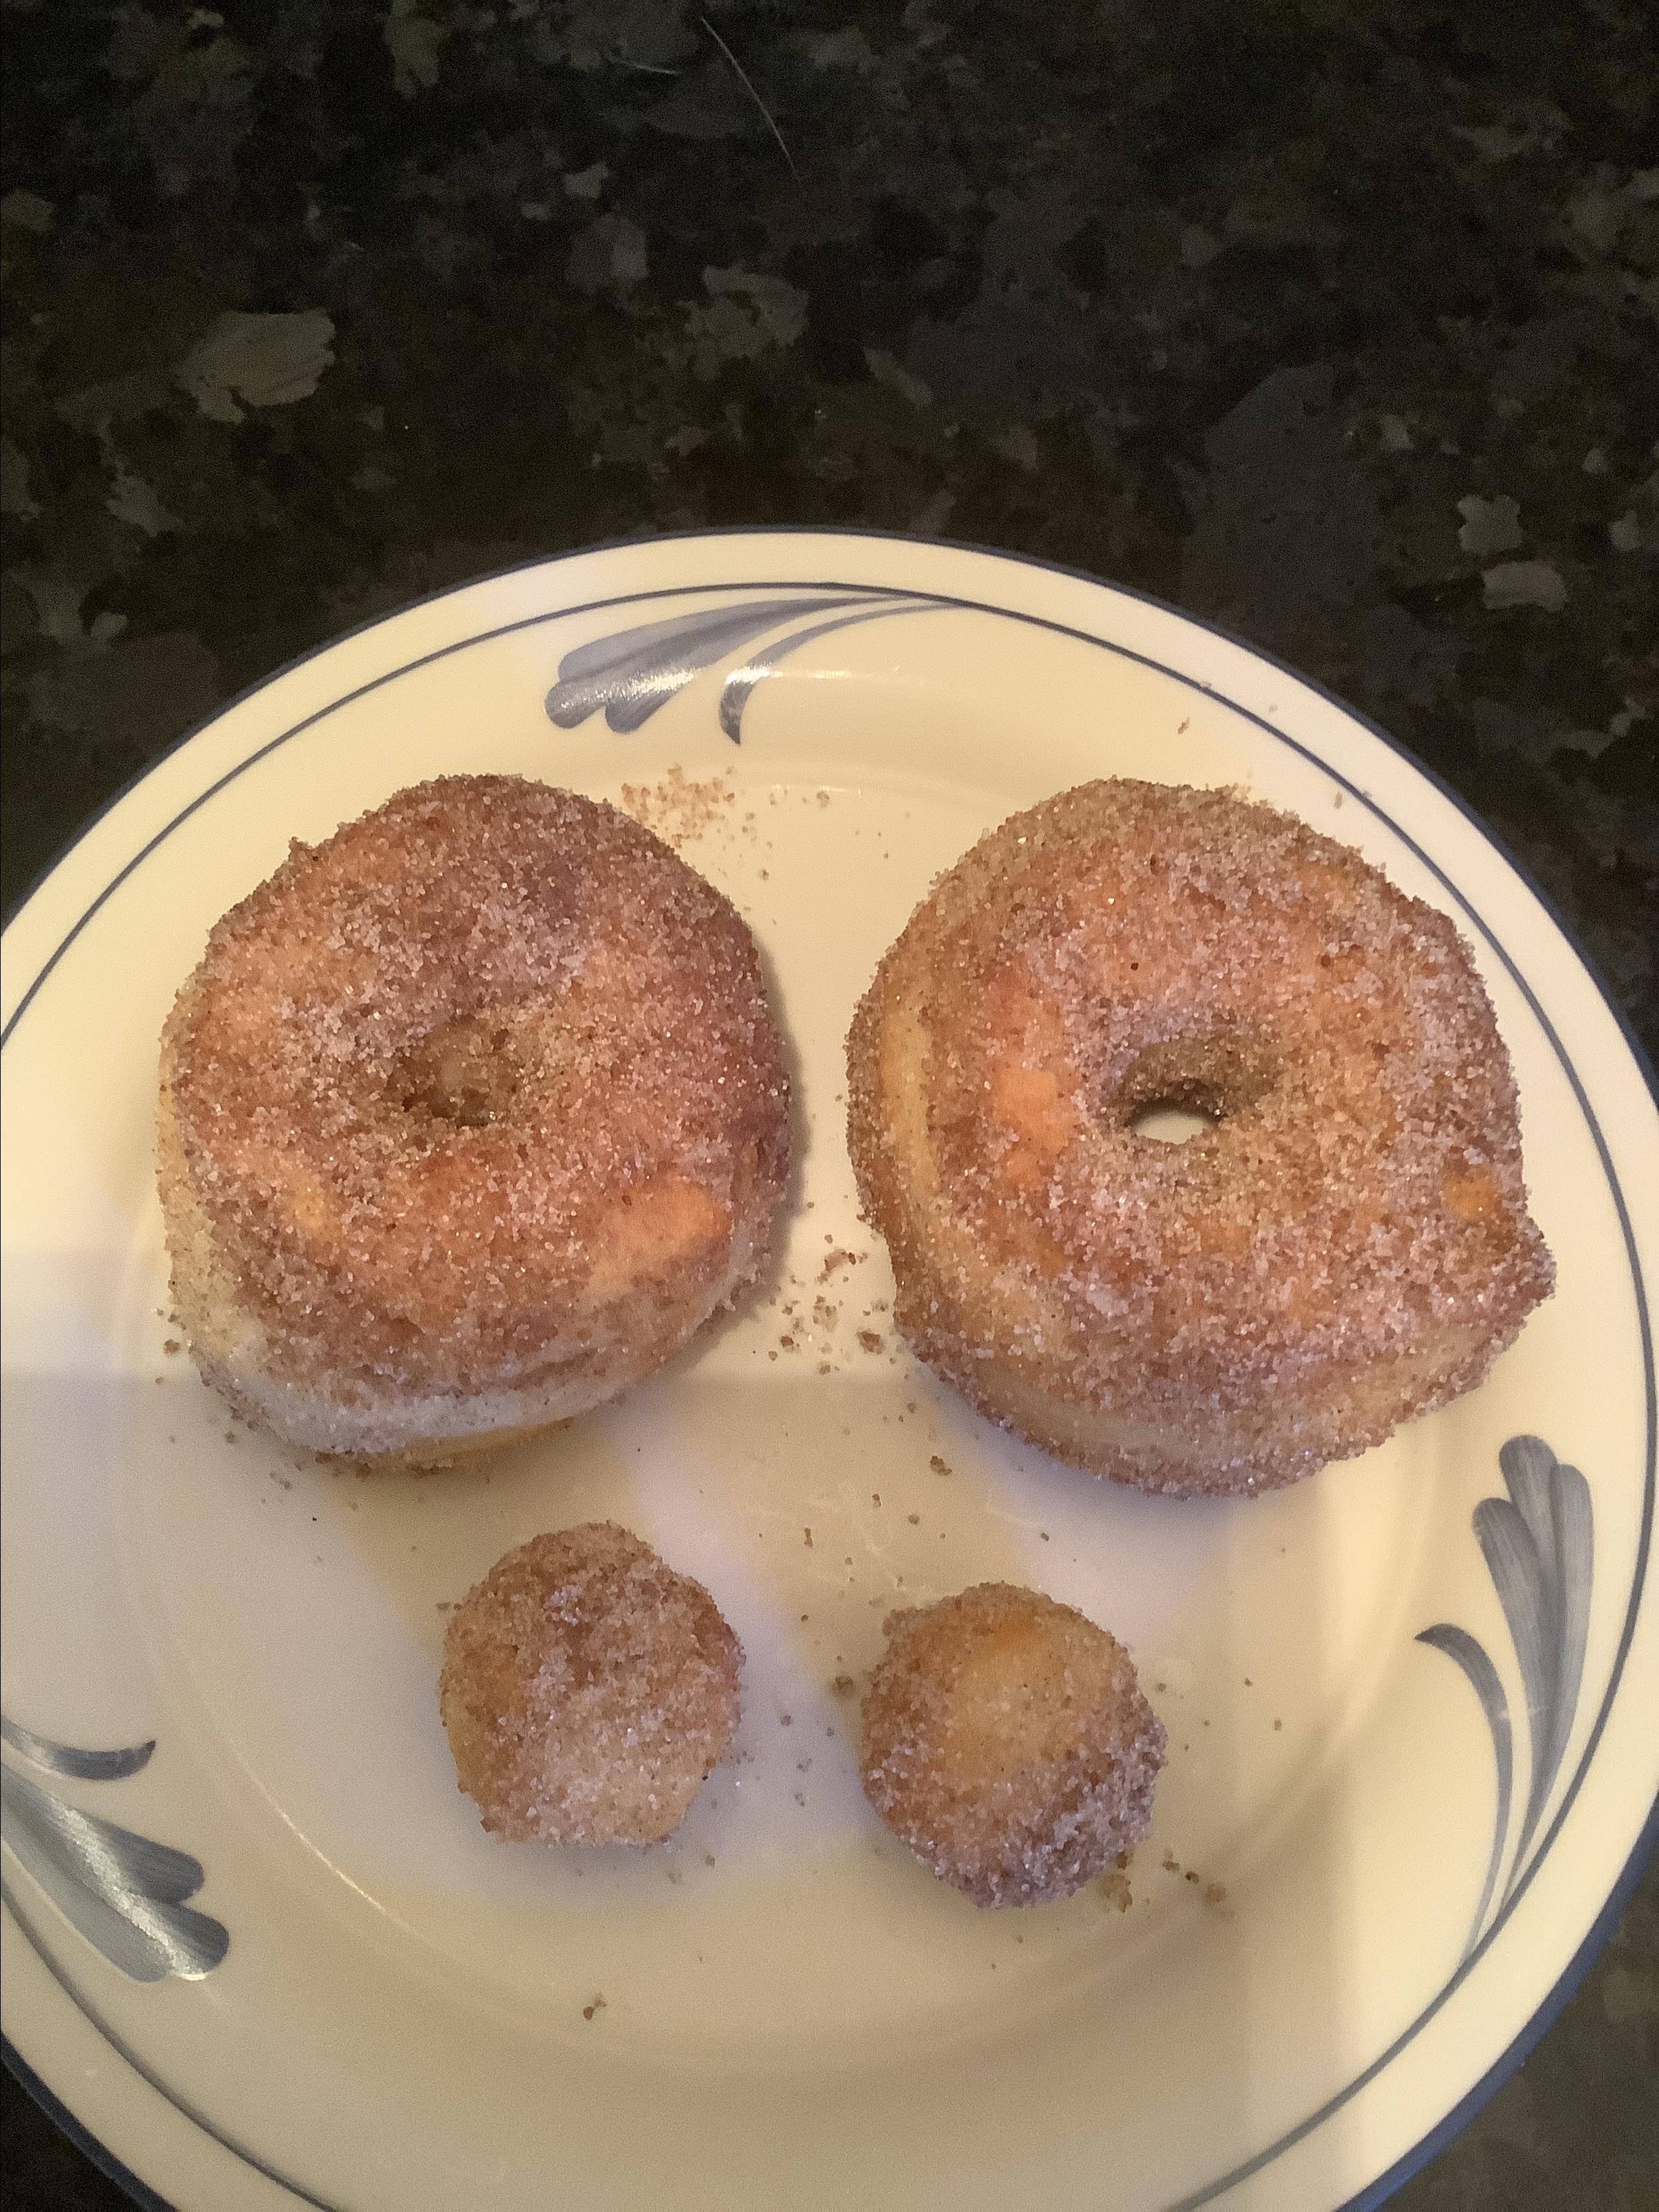 Air Fryer Cinnamon-Sugar Doughnuts Nancy